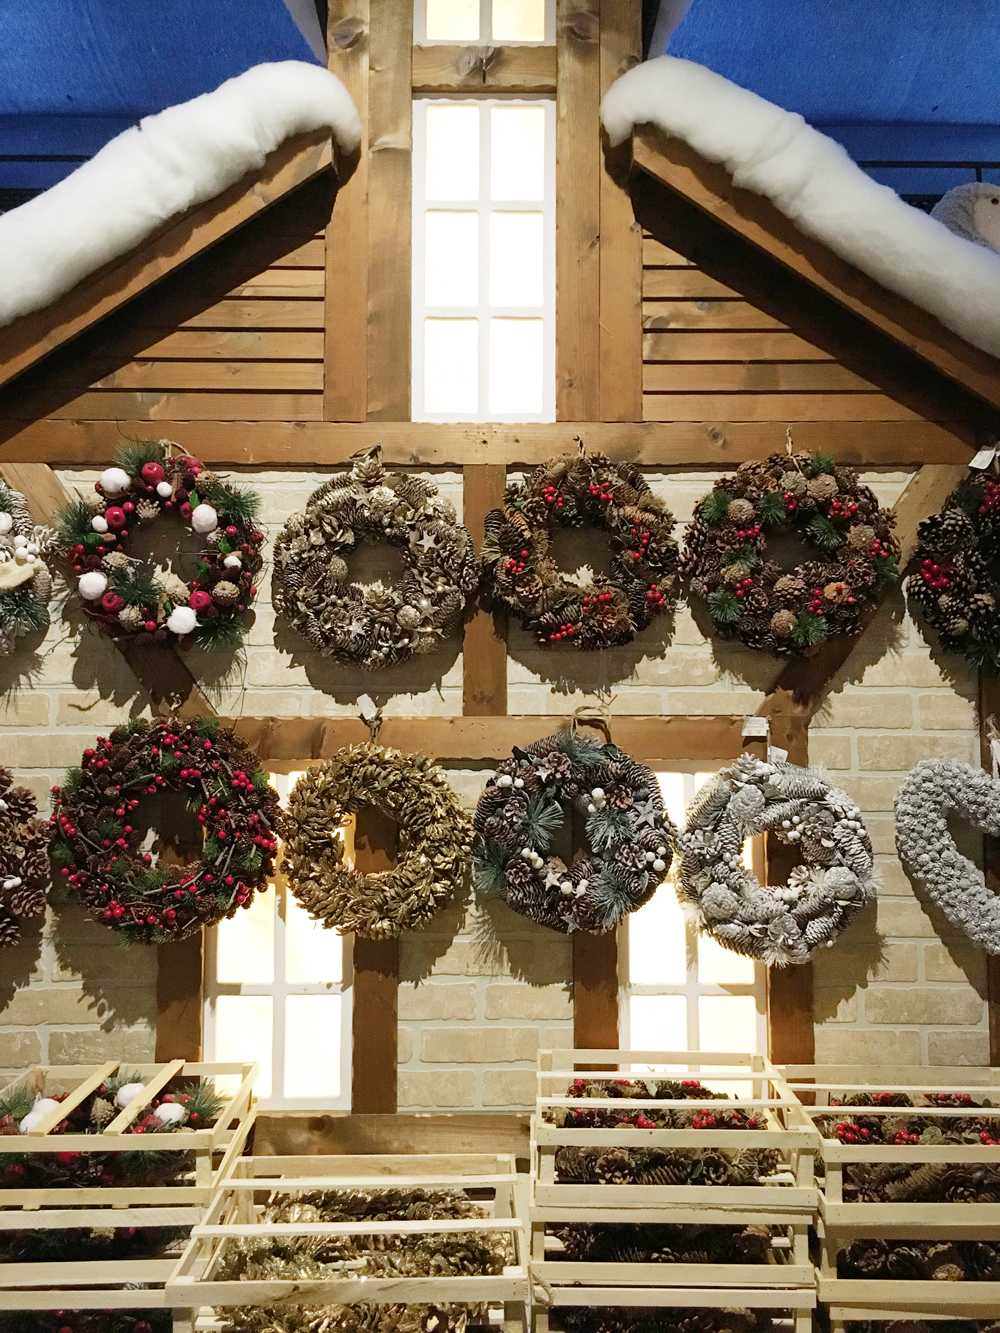 viridea-decorazioni-natale-ghirlande